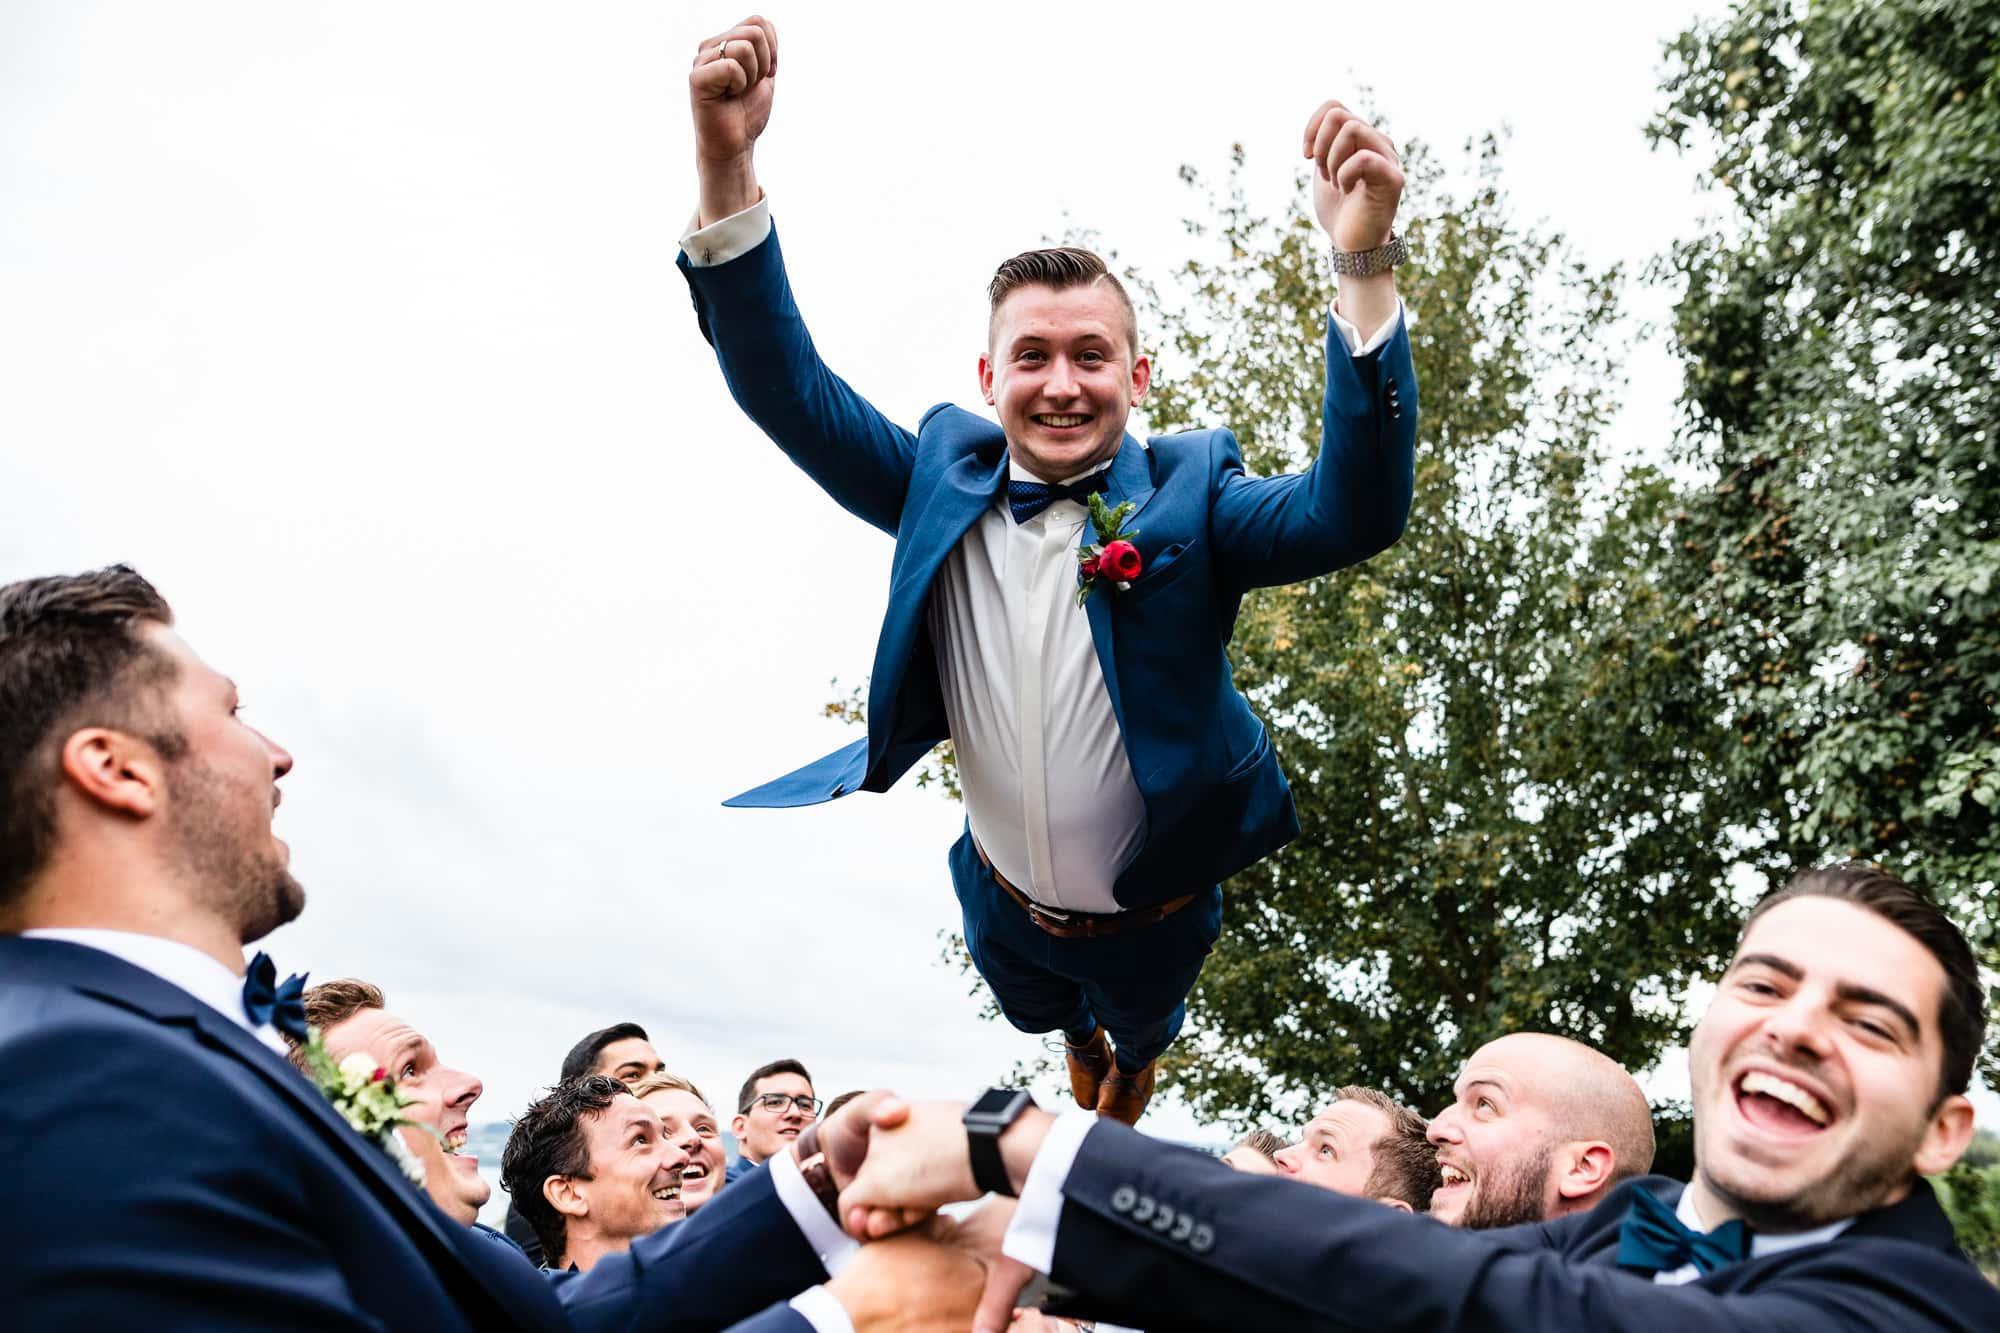 Hochzeitsfotograf Birnauer Oberhof